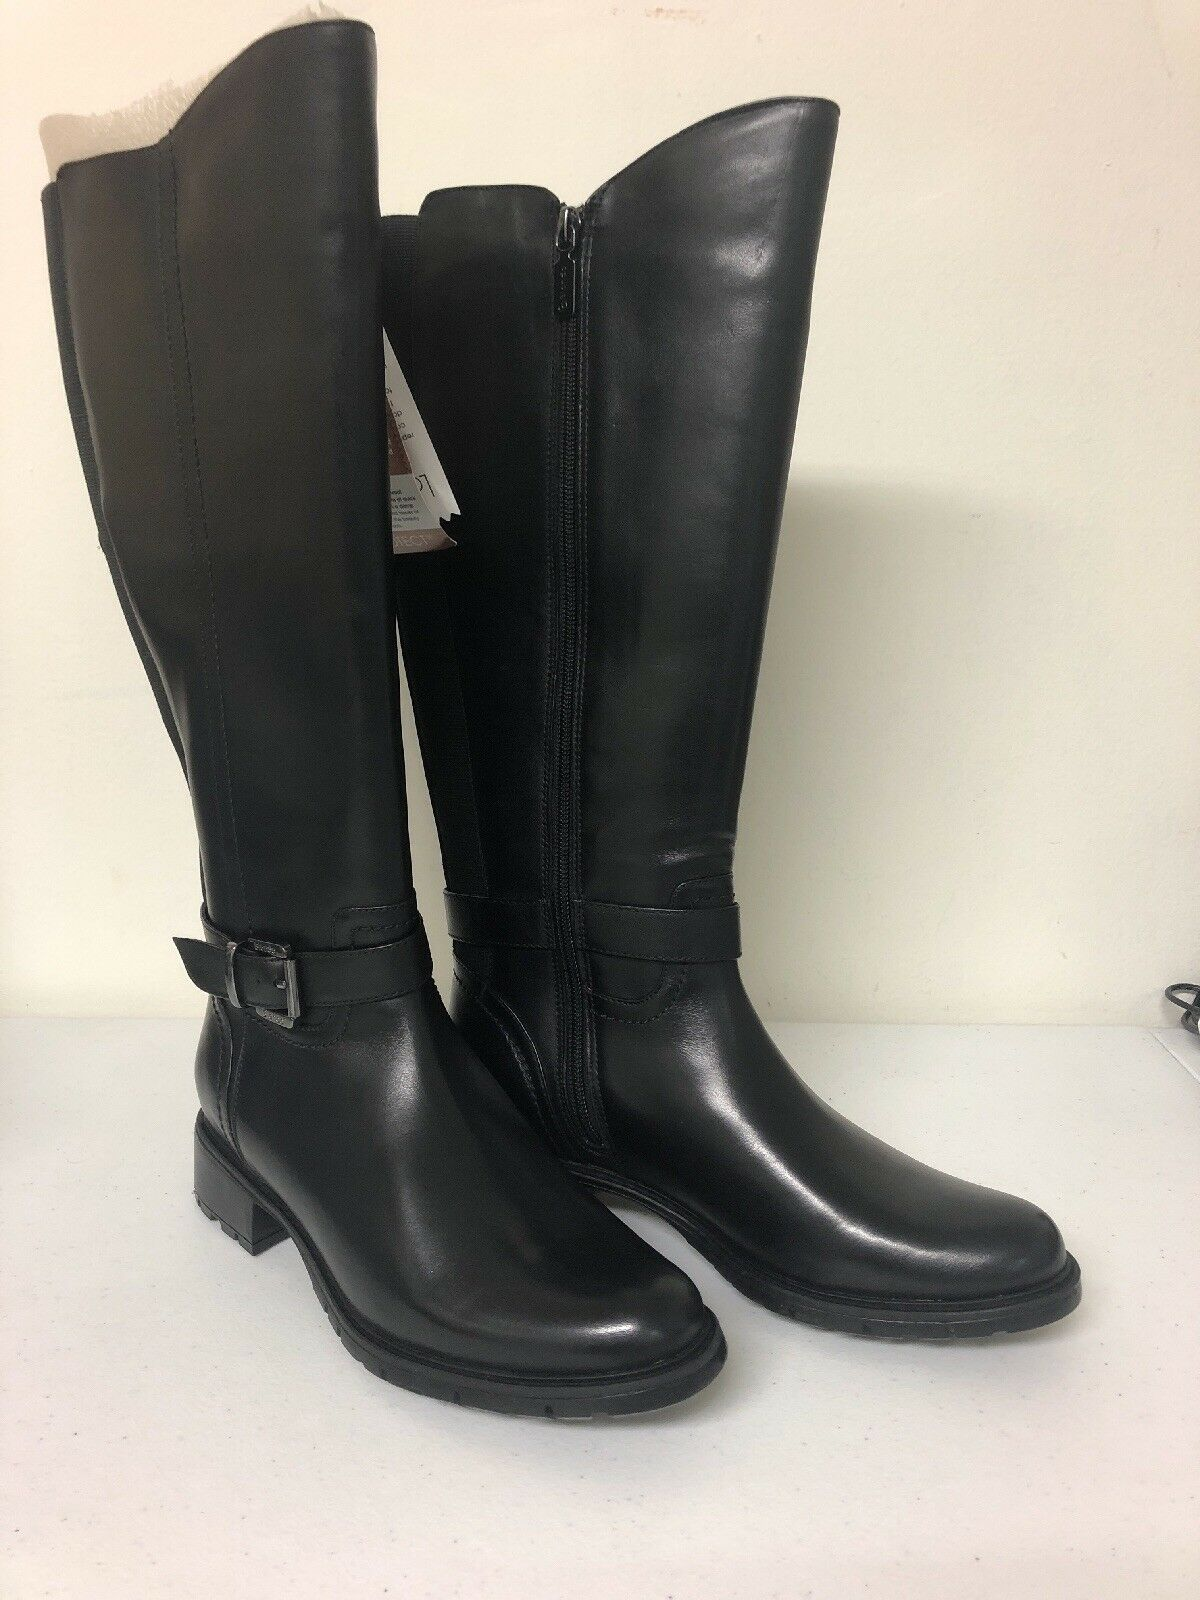 Blondo Womens Boots, Black Size 6W